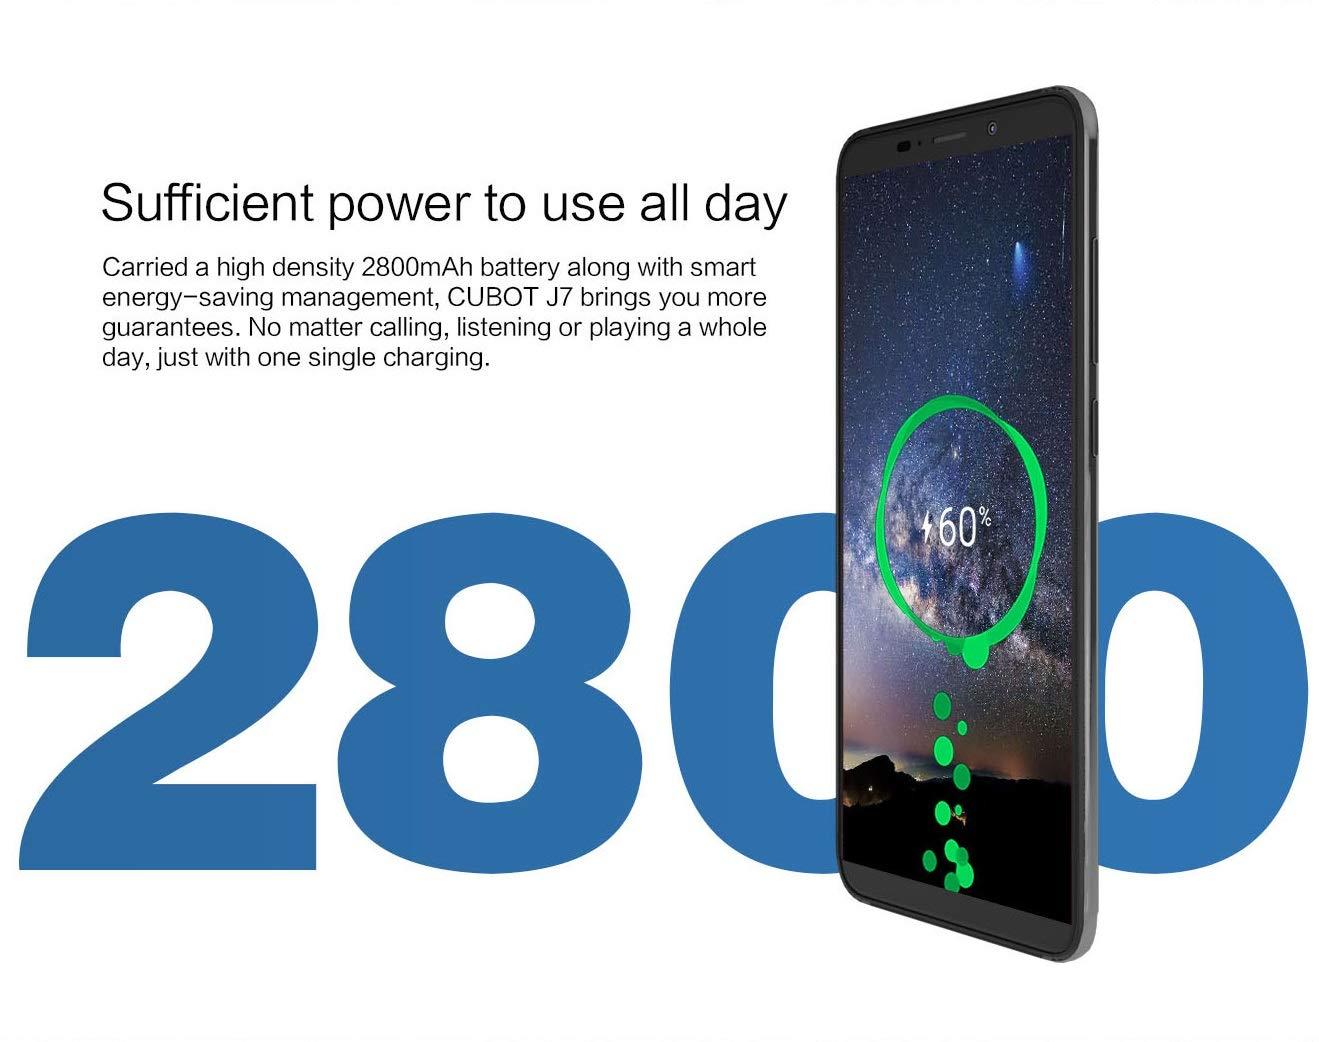 CUBOT J7 Smartphone Pas Cher Android 9.0, Telephone Portable Debloqué 3G Triple Emplacement 2 Nano SIM + 1 MicroSD, Moblie MT6580 2Go RAM+ 16Go Rom Dual 13 + 2MP Camera FaceID-Vert